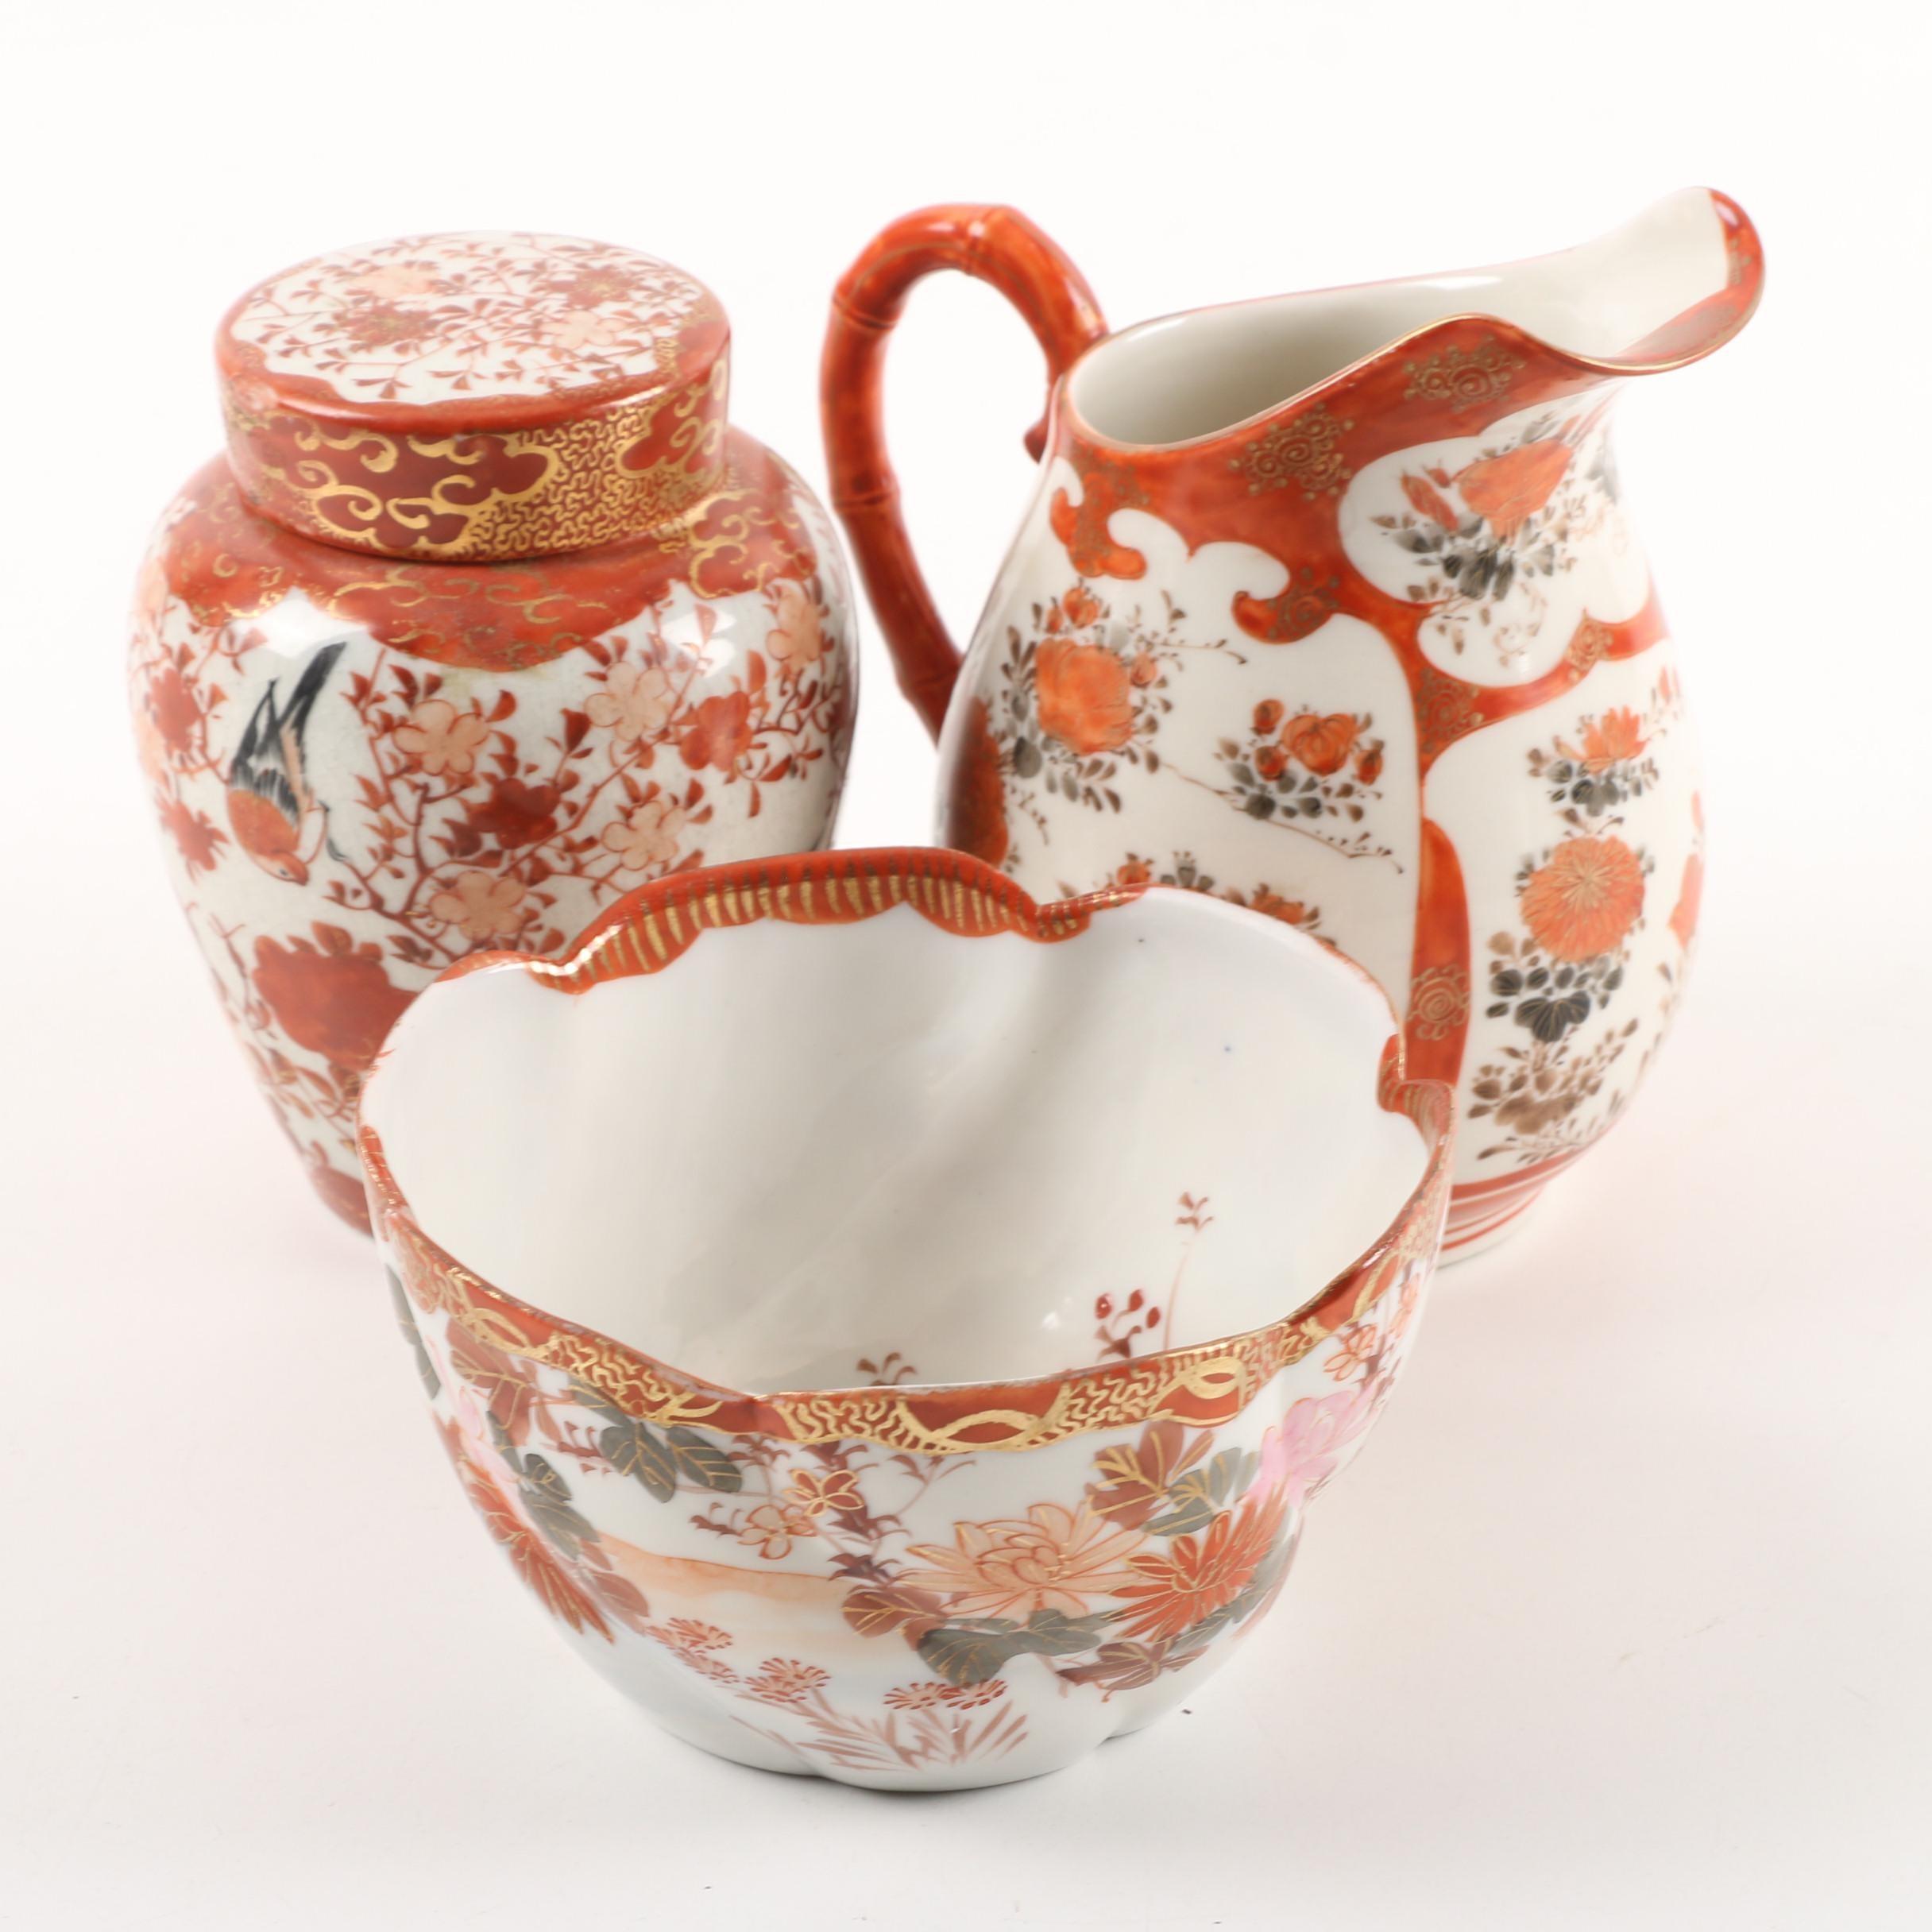 Japanese Kutani Porcelain Serveware